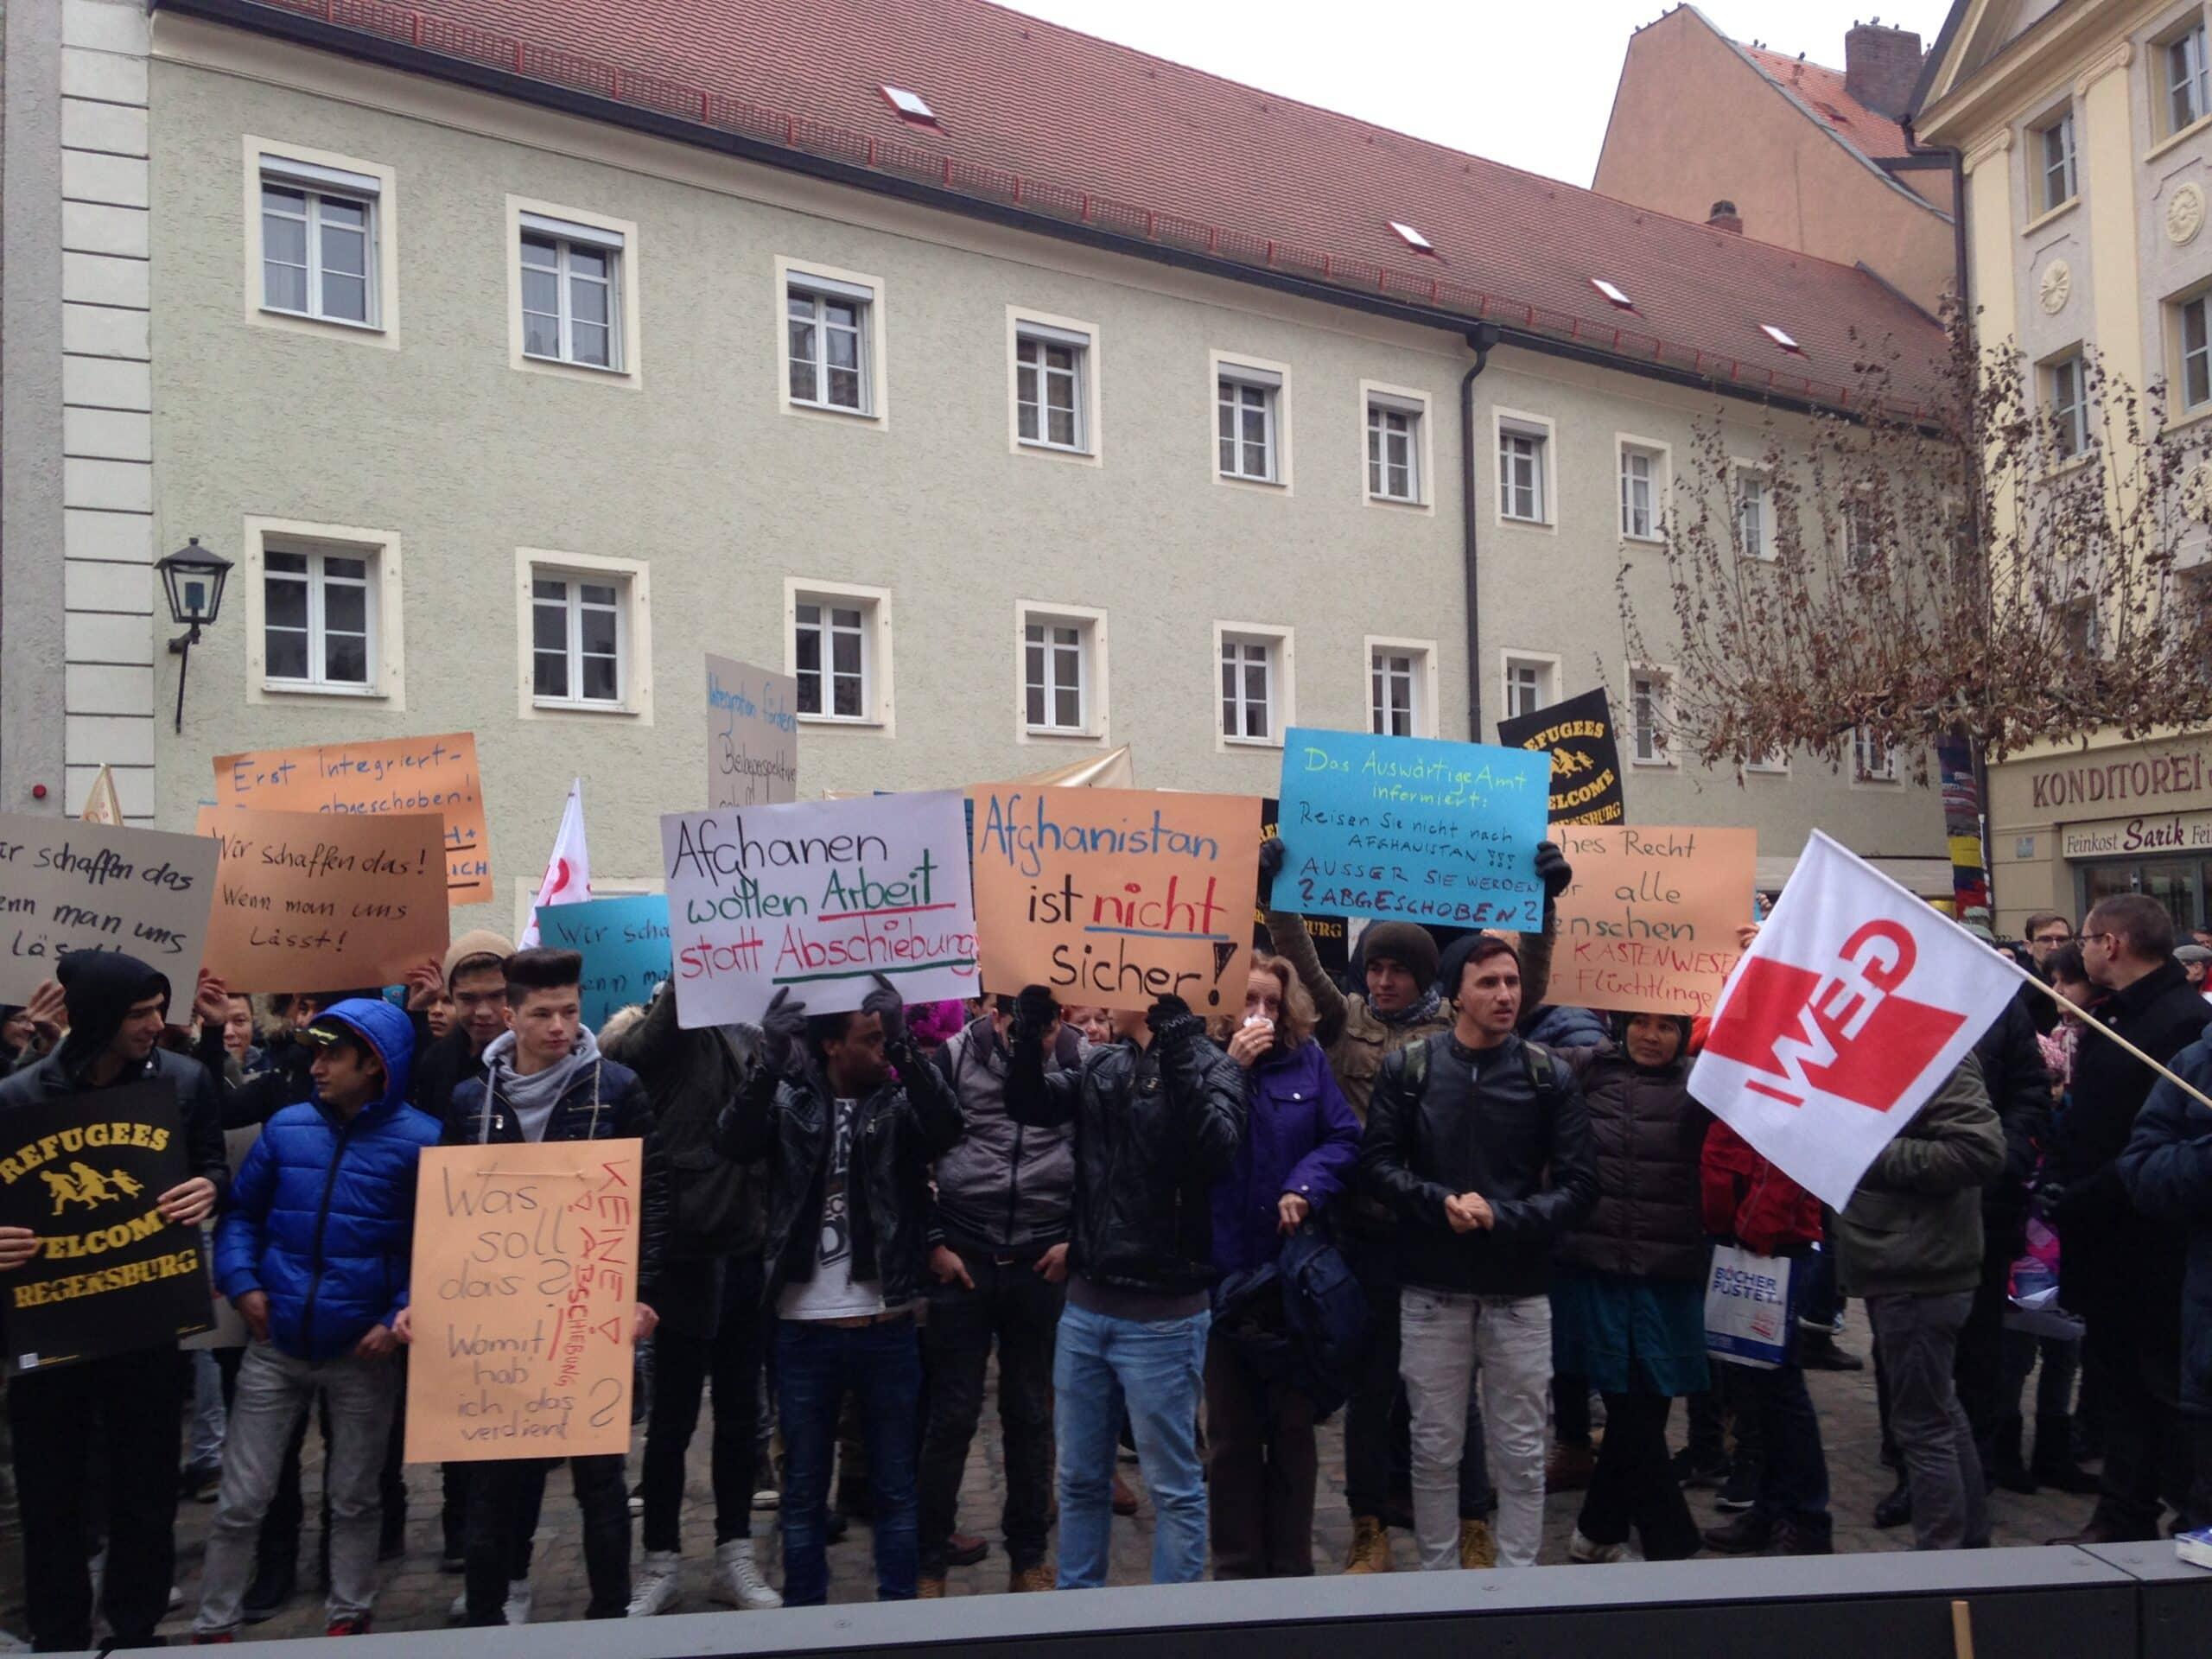 Ausbildung Statt Abschiebung Regensburg